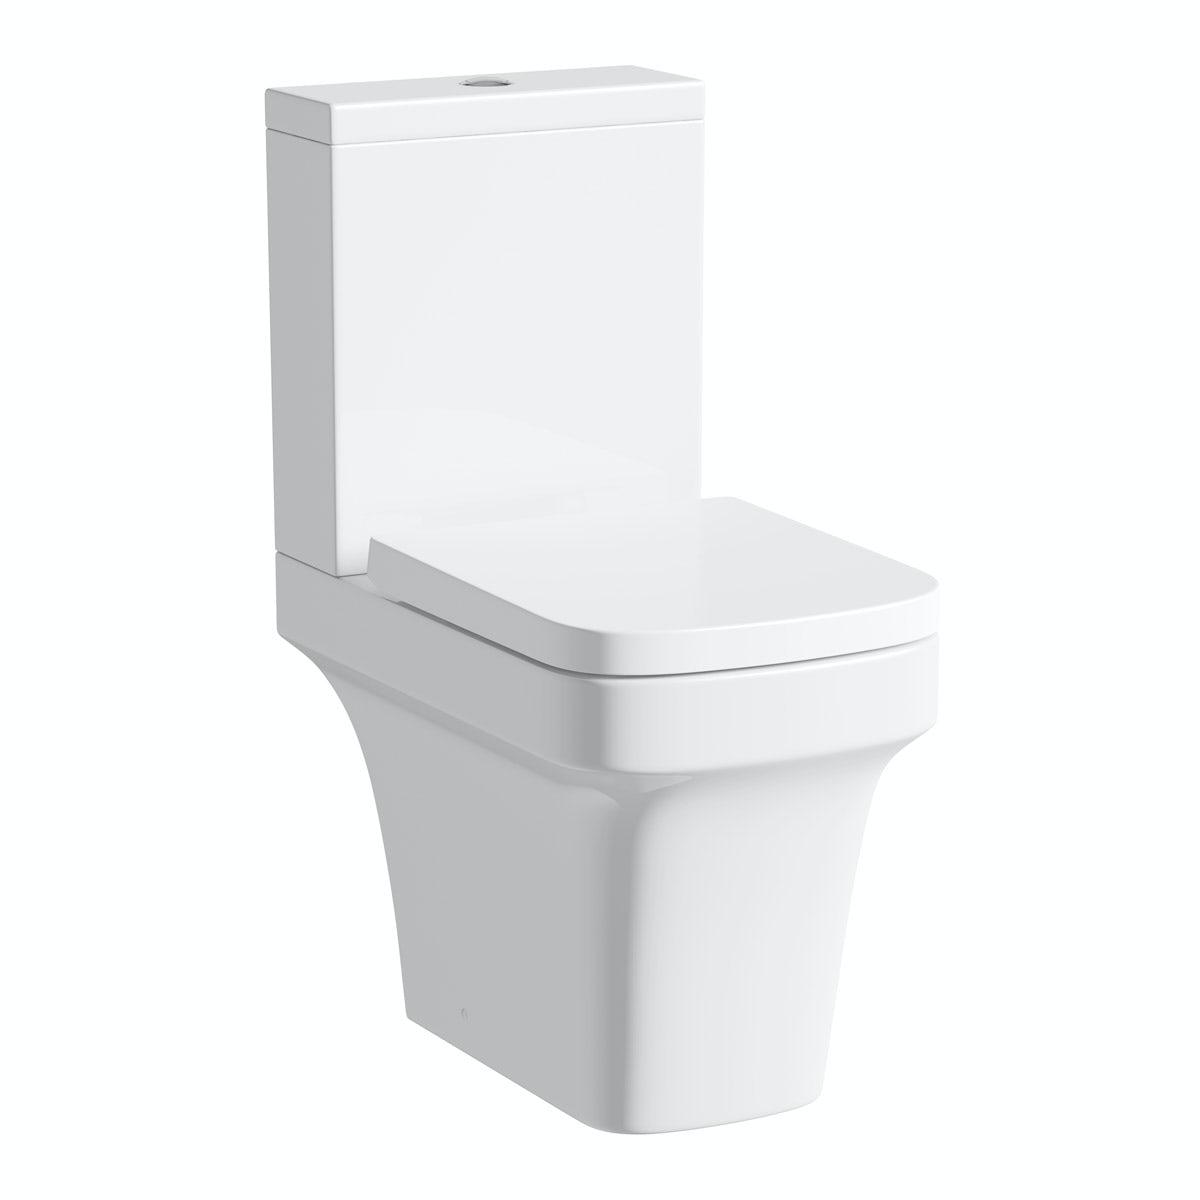 Carter close coupled toilet inc soft close seat